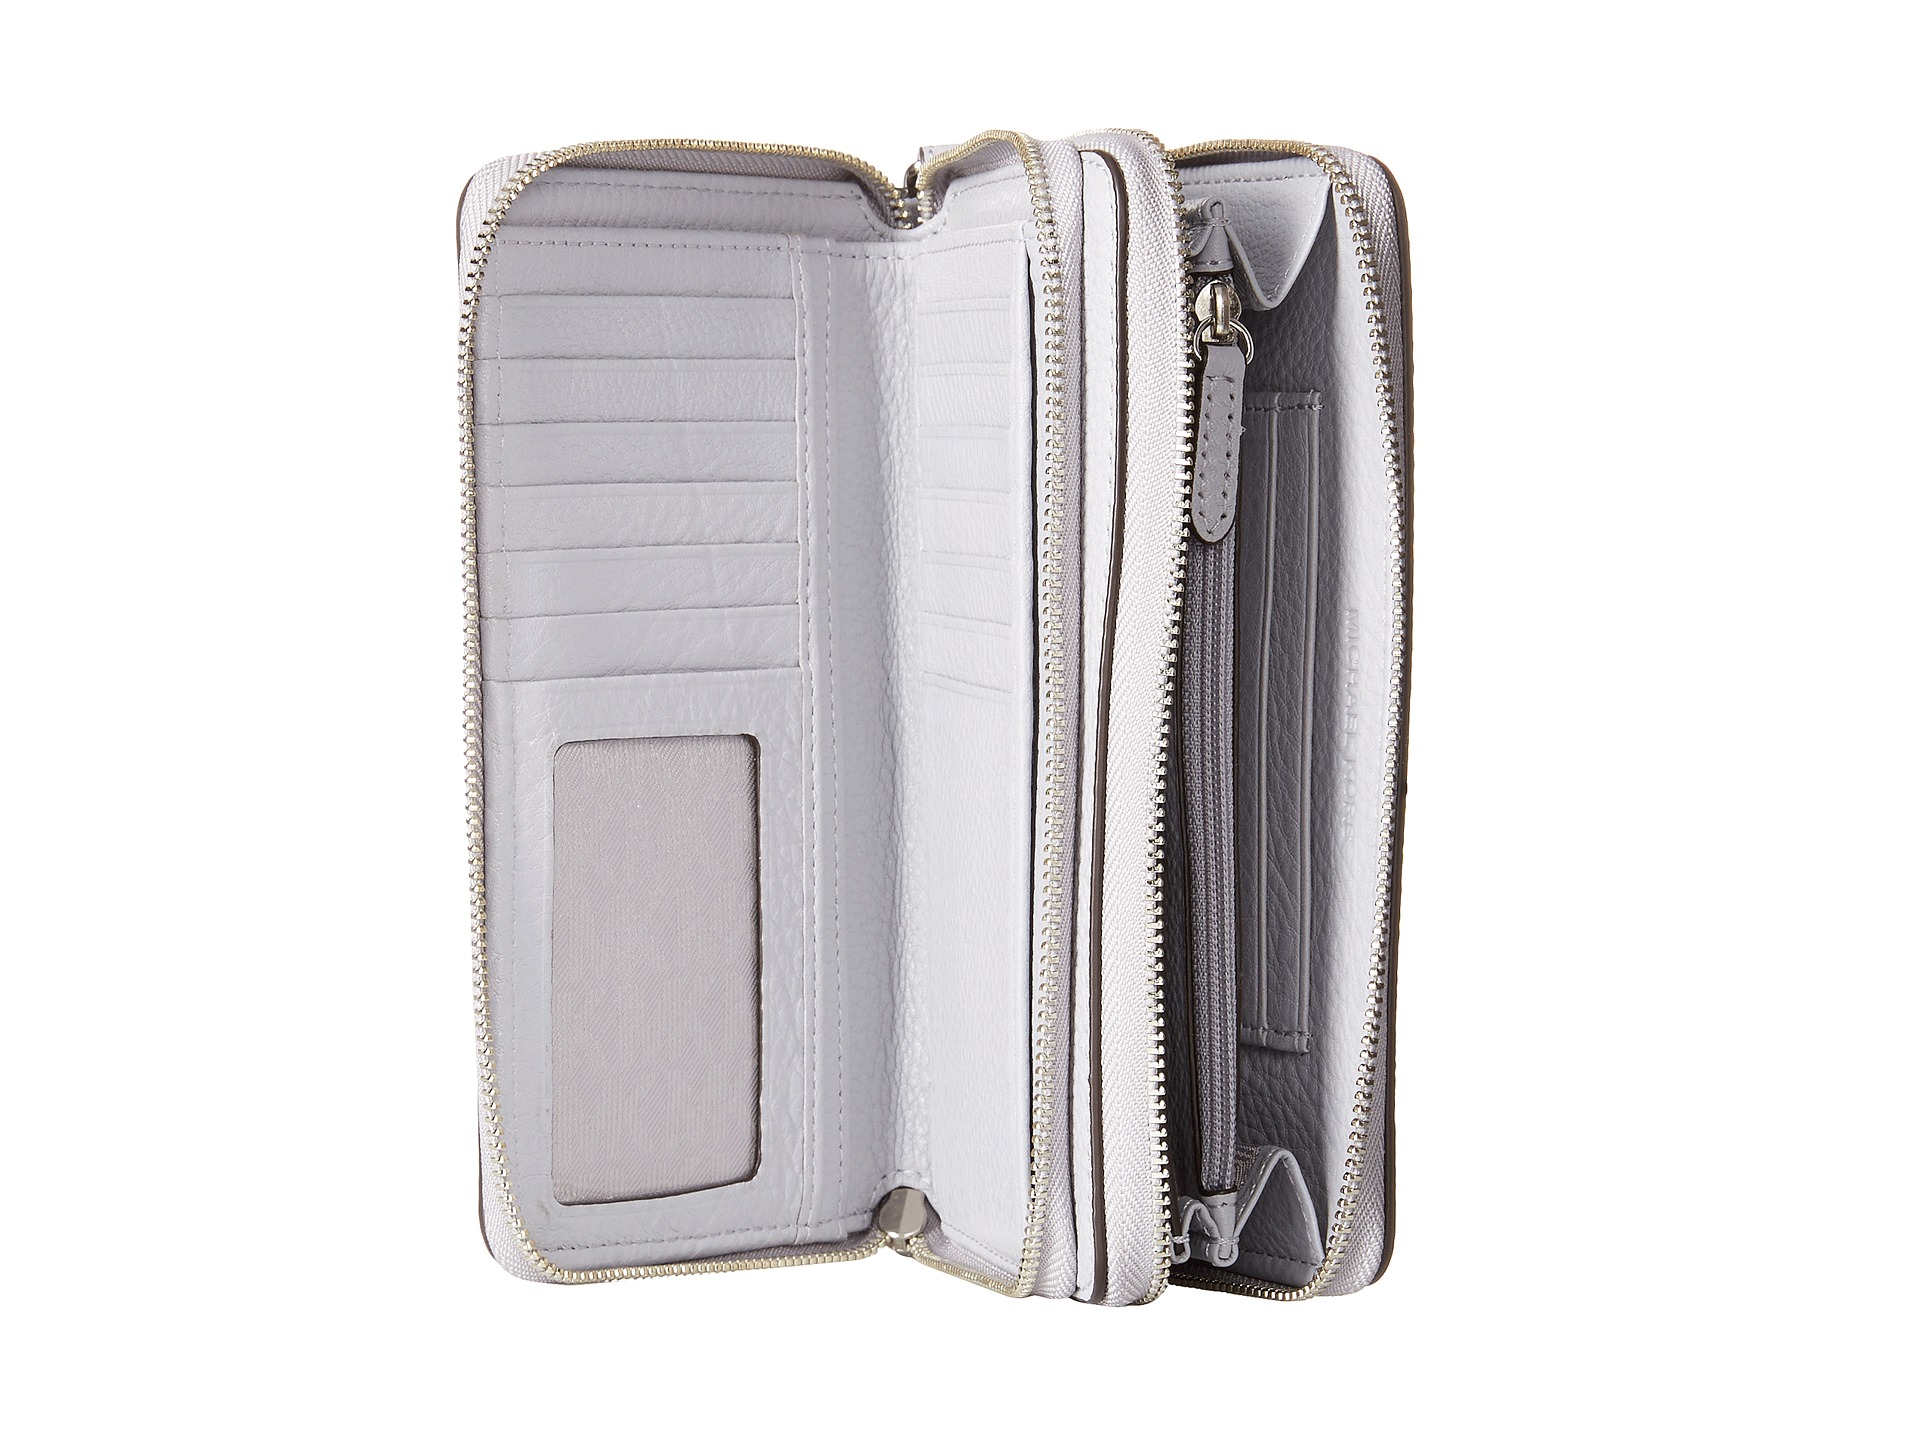 f9363da7f8e3 MICHAEL Michael Kors Adele Large Flat Multifunction Phone Case in ...